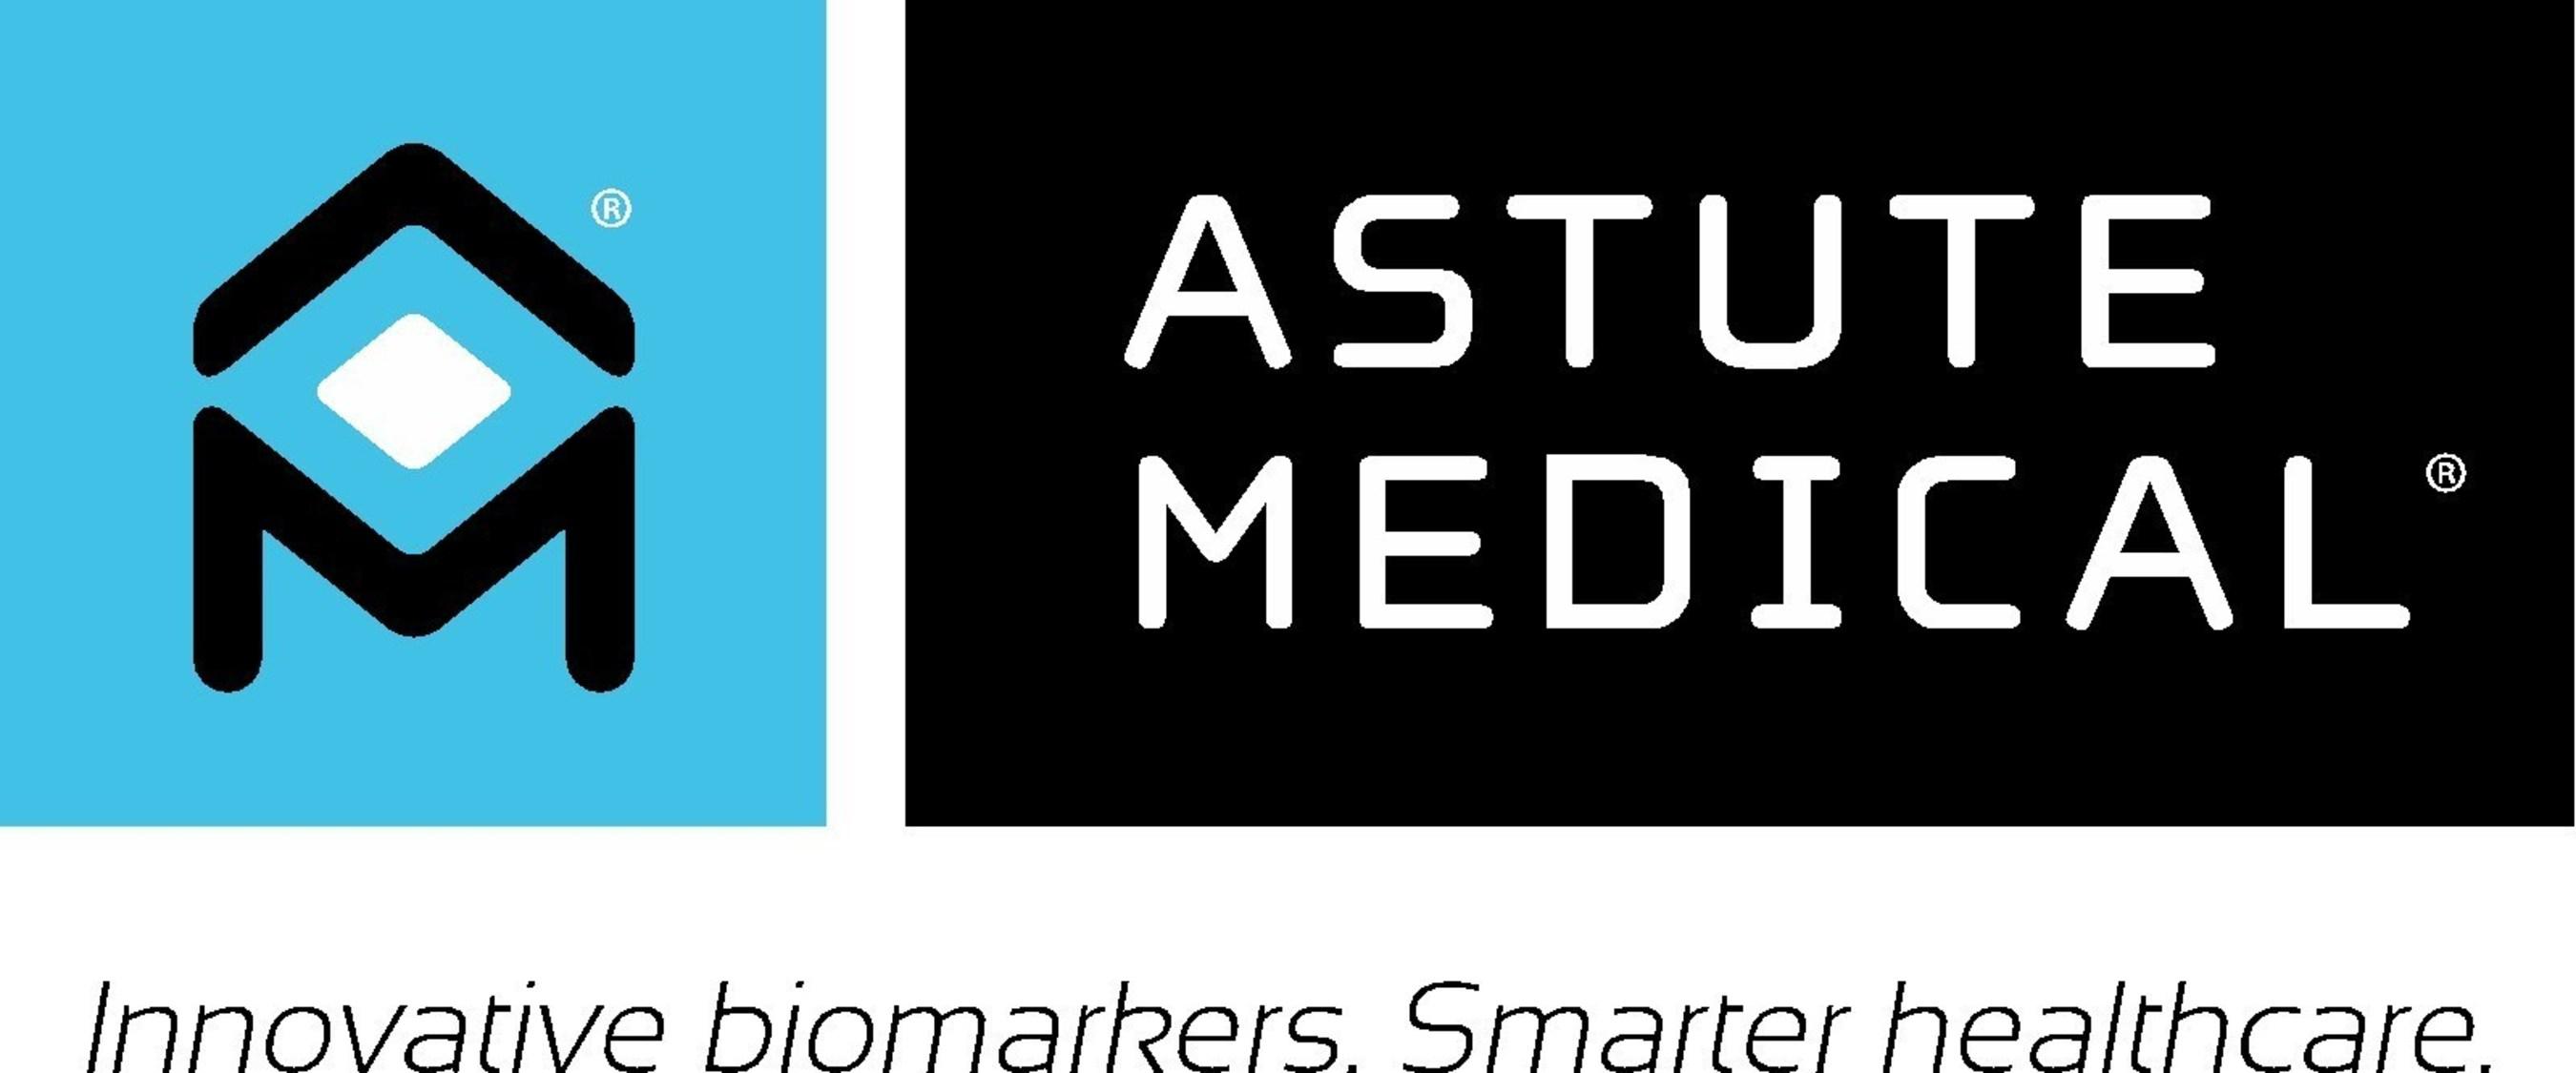 Astute Medical Logo (PRNewsFoto/Astute Medical, Inc.)